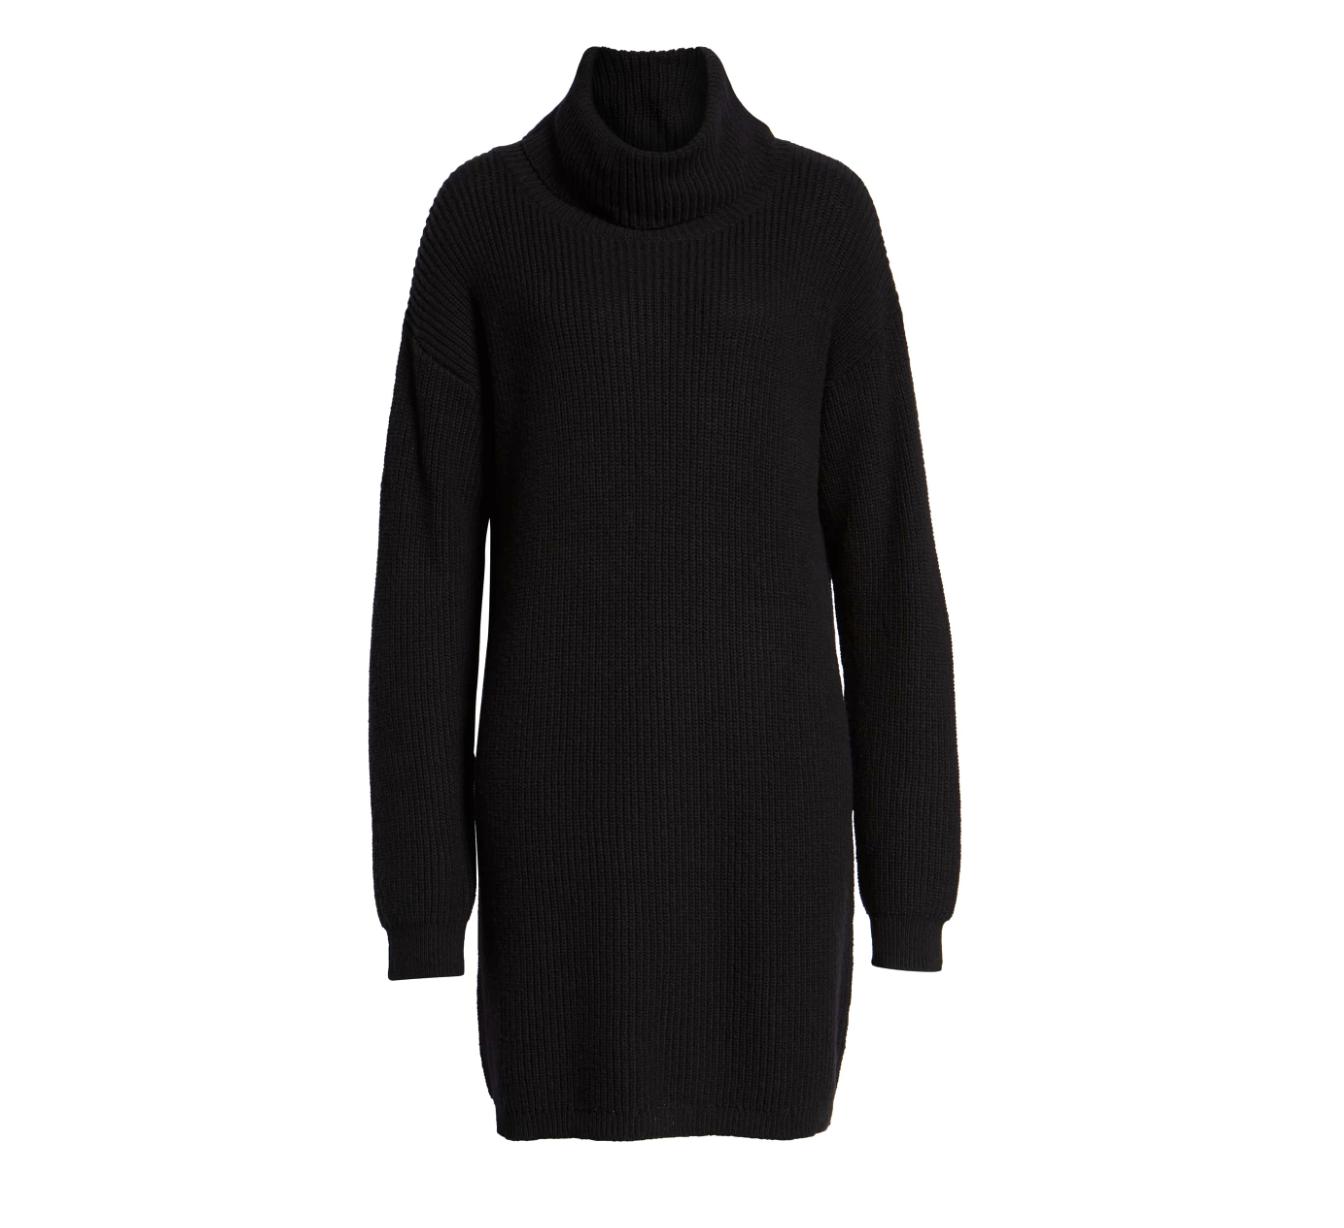 B.P. Cowl Neck Sweater Dress